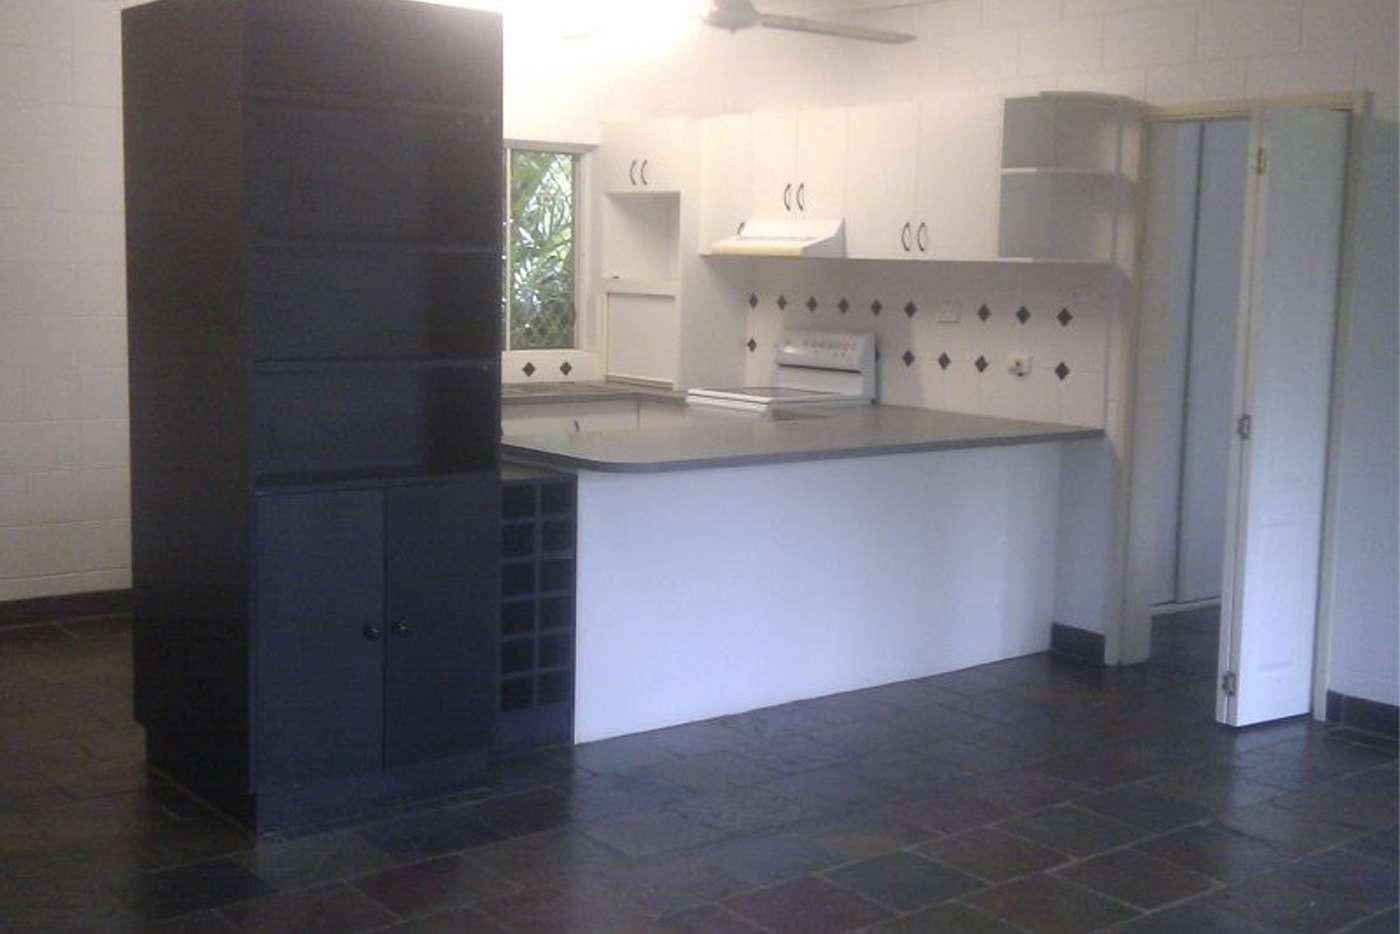 Main view of Homely house listing, 38 Albatross Street, Kewarra Beach QLD 4879